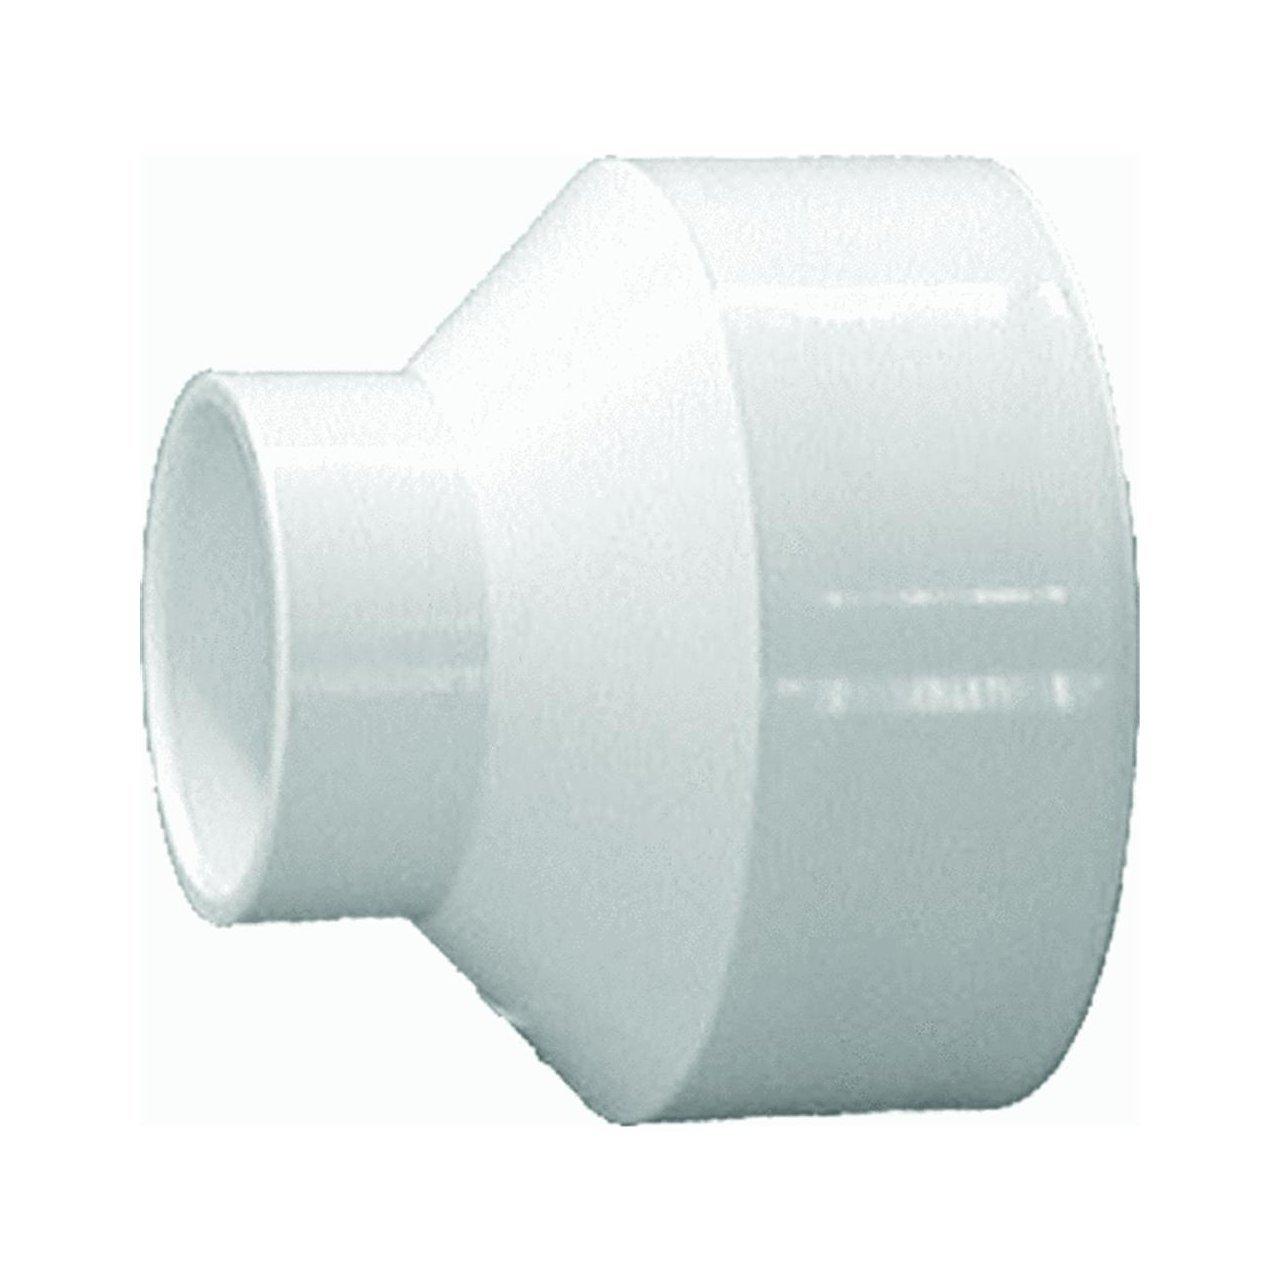 Genova pvc dwv reducing coupling size quot is